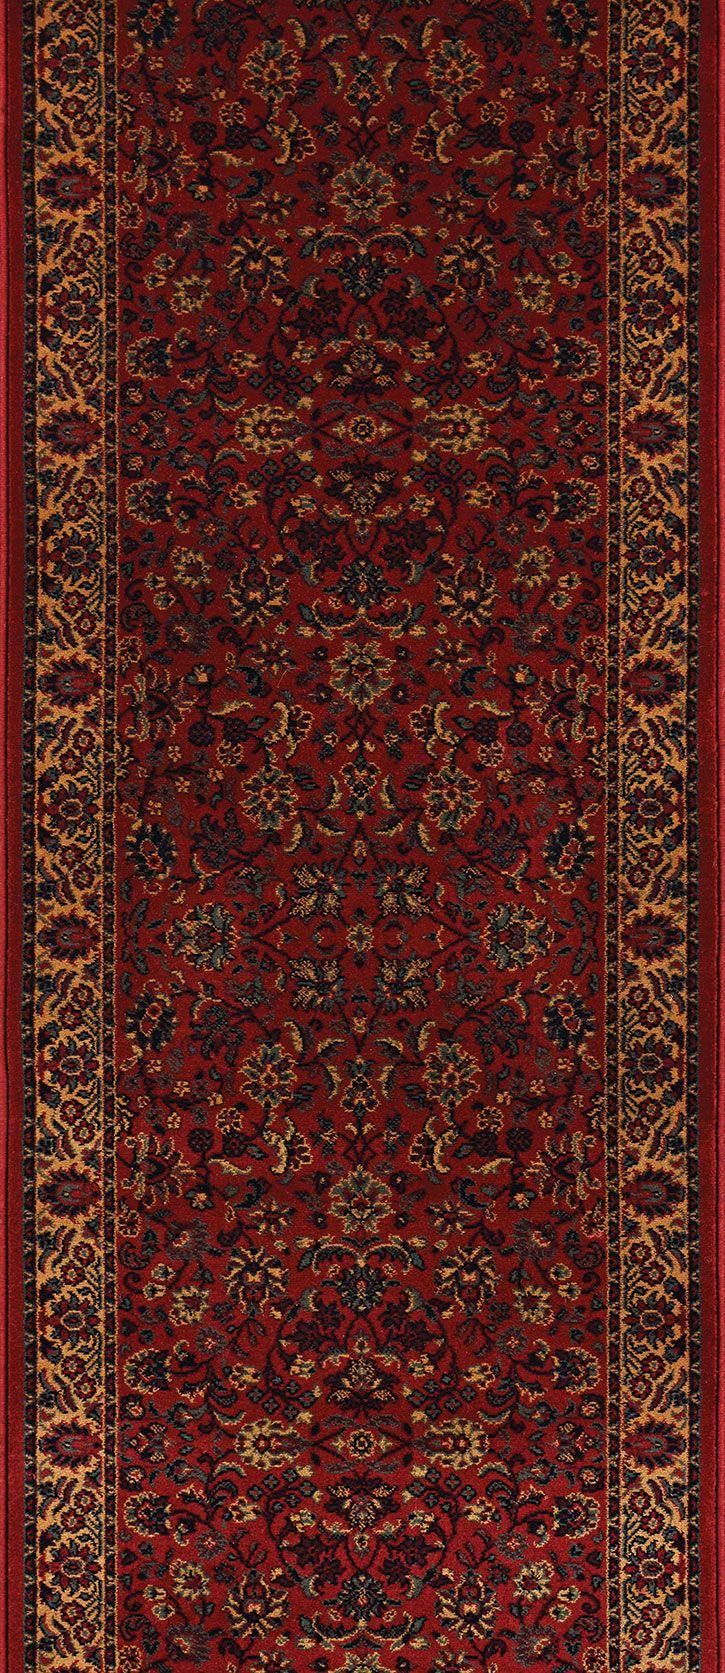 Best Couristan Everest 3791 4872A Isfahan Crimson 2 2 26 400 x 300